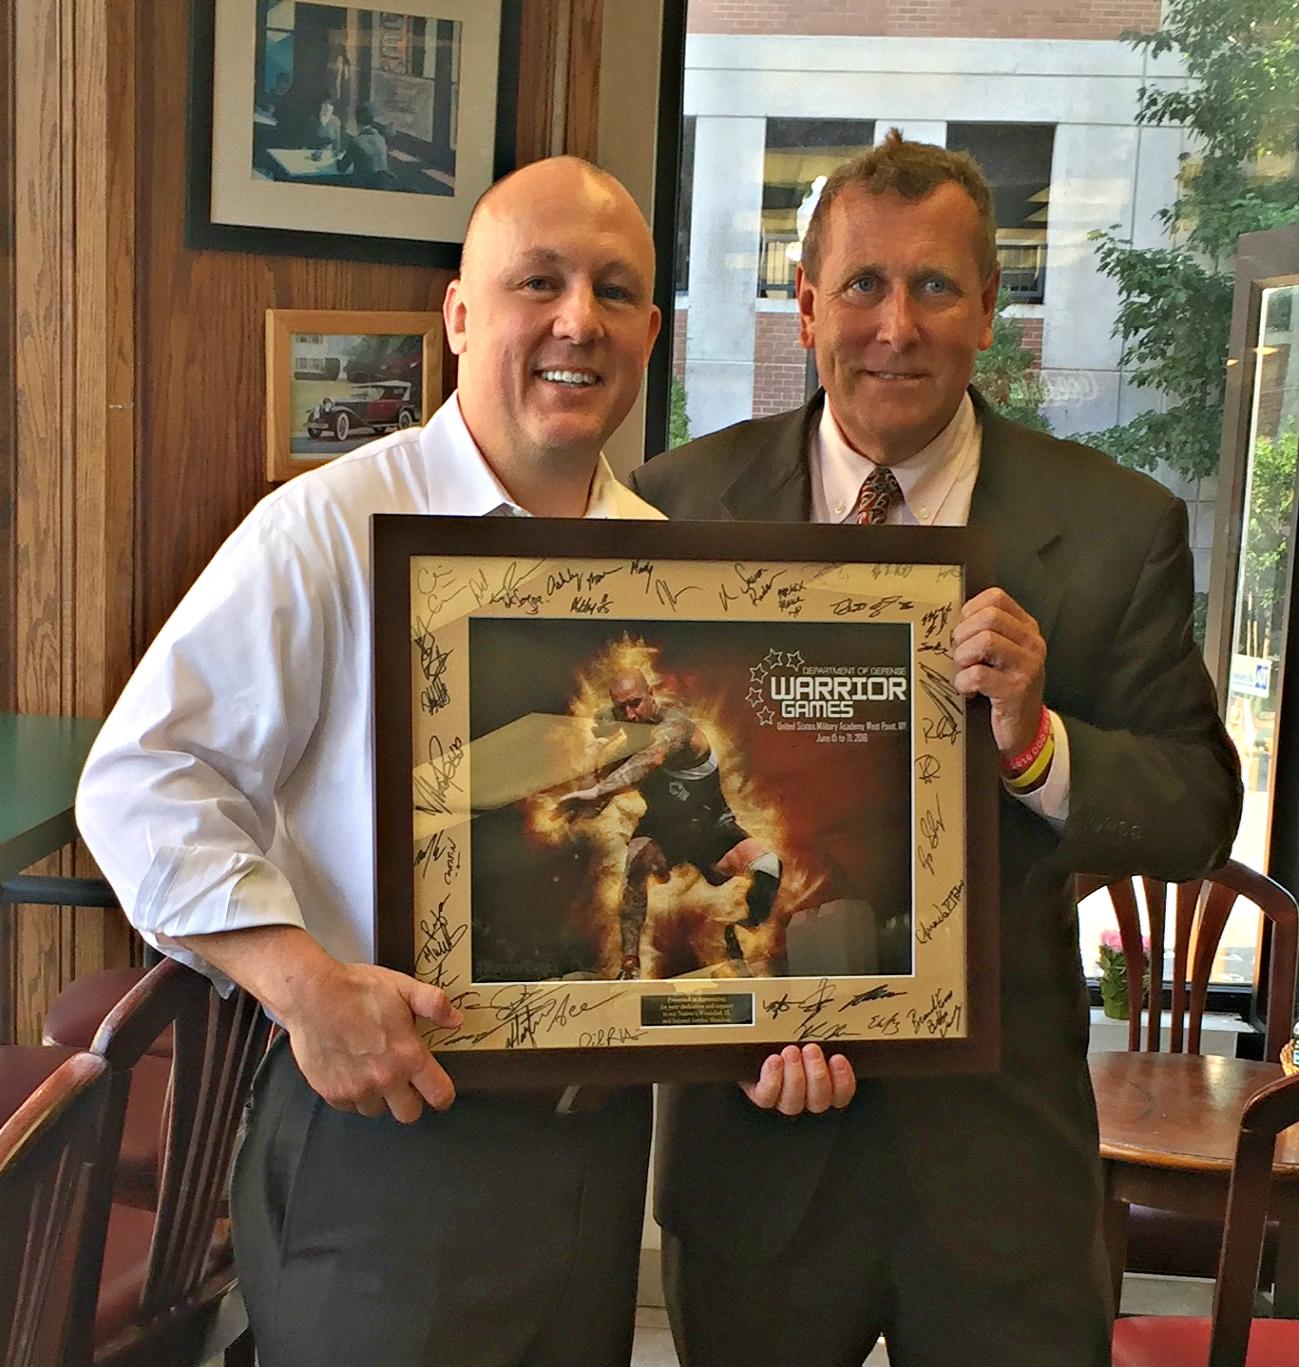 Warrior Games Representative Presents Award to UMA President